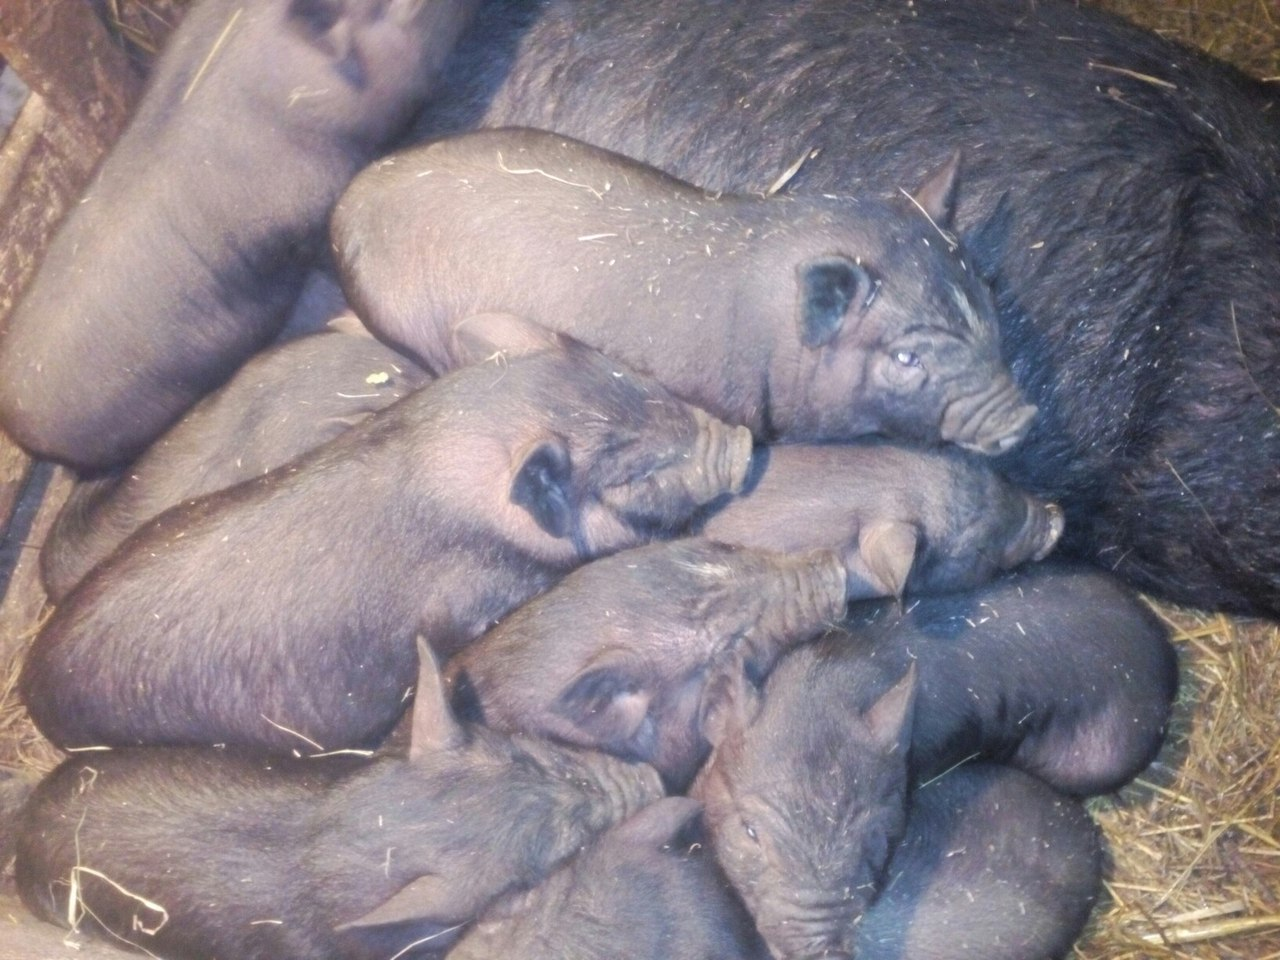 Purebred Vietnamese pigs